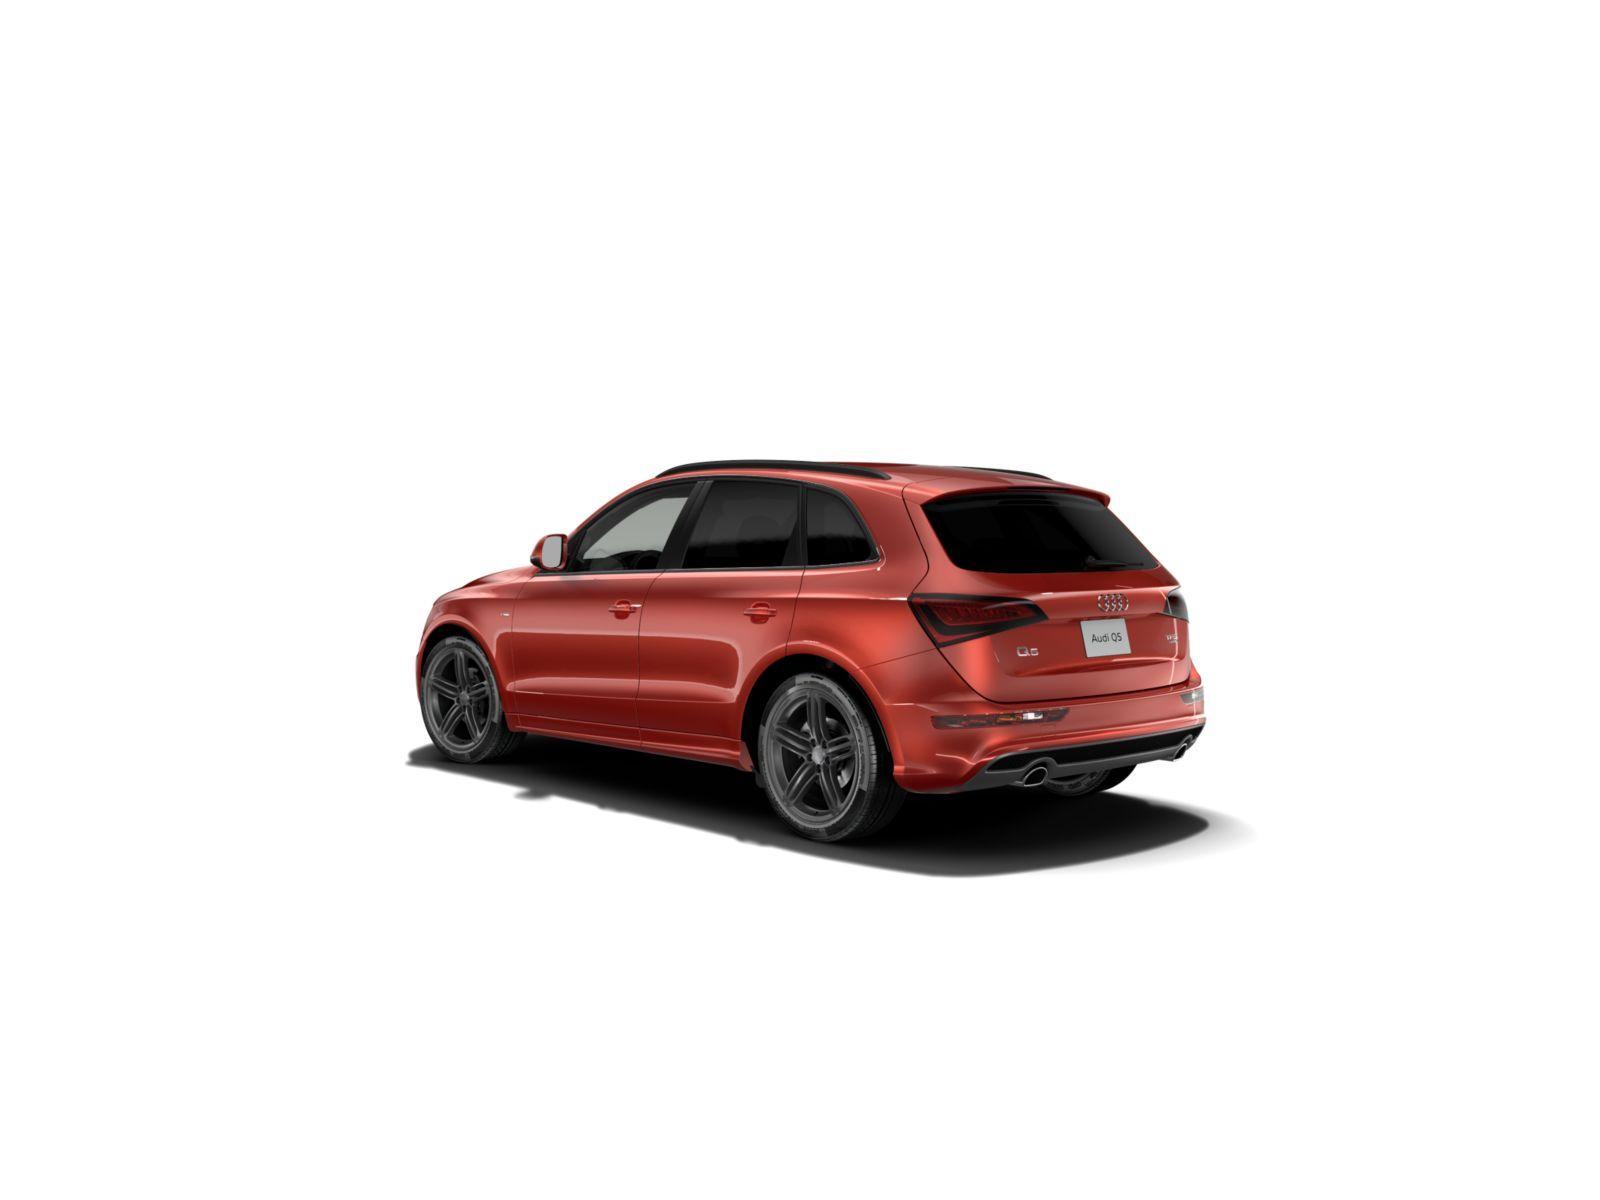 Build Audi Q5 >> Build Your Own Audi Q5 Car Configurator Audi Usa Cars